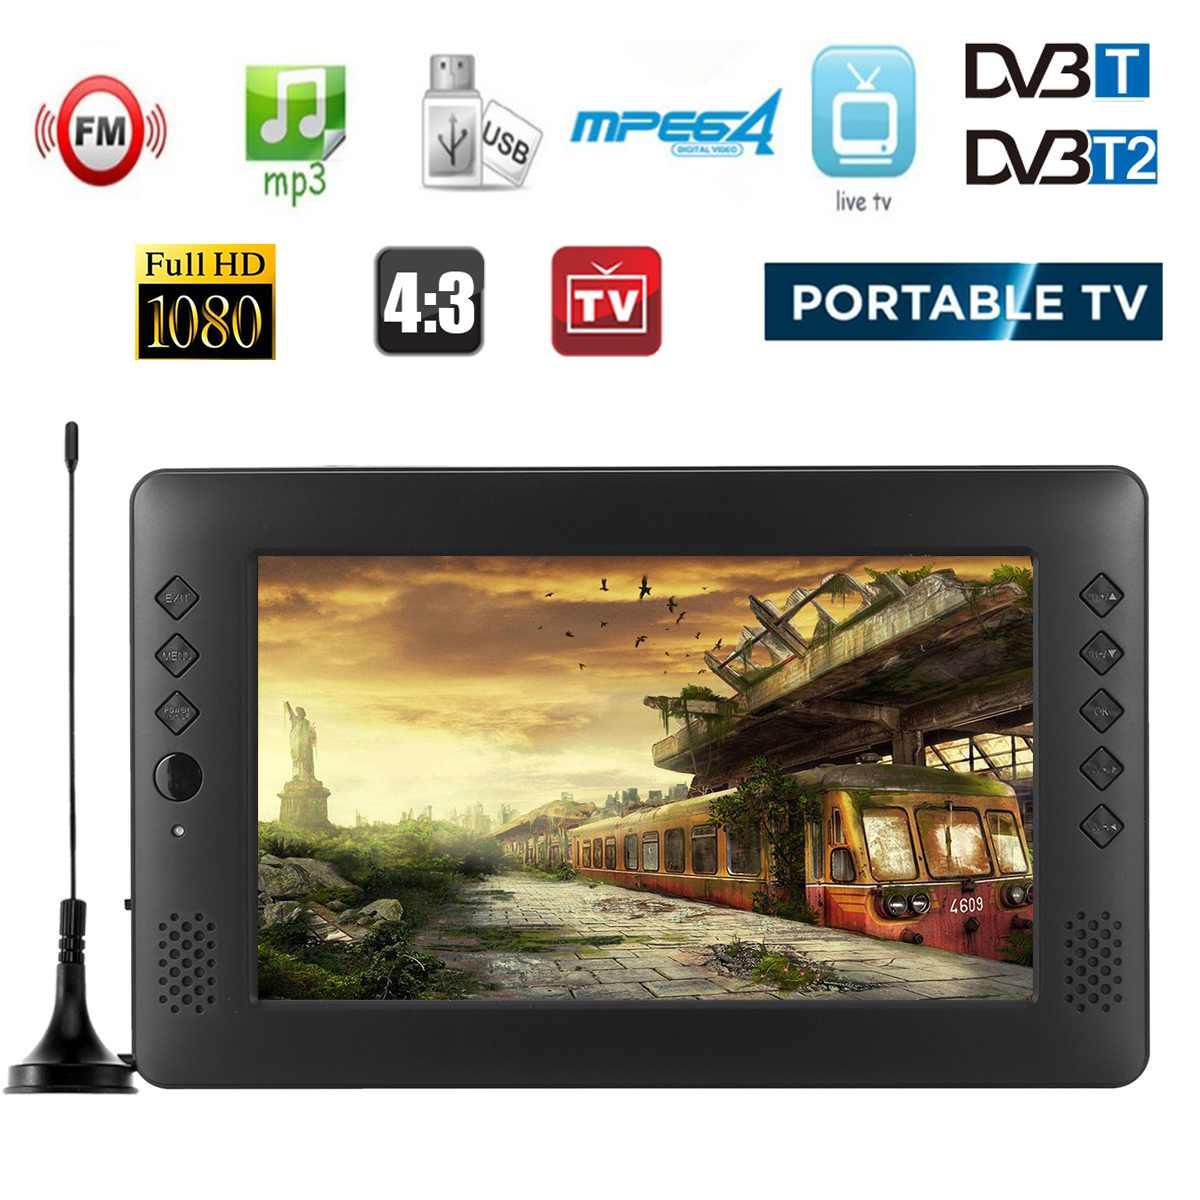 12V 9 Inch HD Portable Mini WiFi Digital And Analog TV DVB-T2 DVB-T DTV ATV Car Smart Television USB TF Card MP4 Audio Video